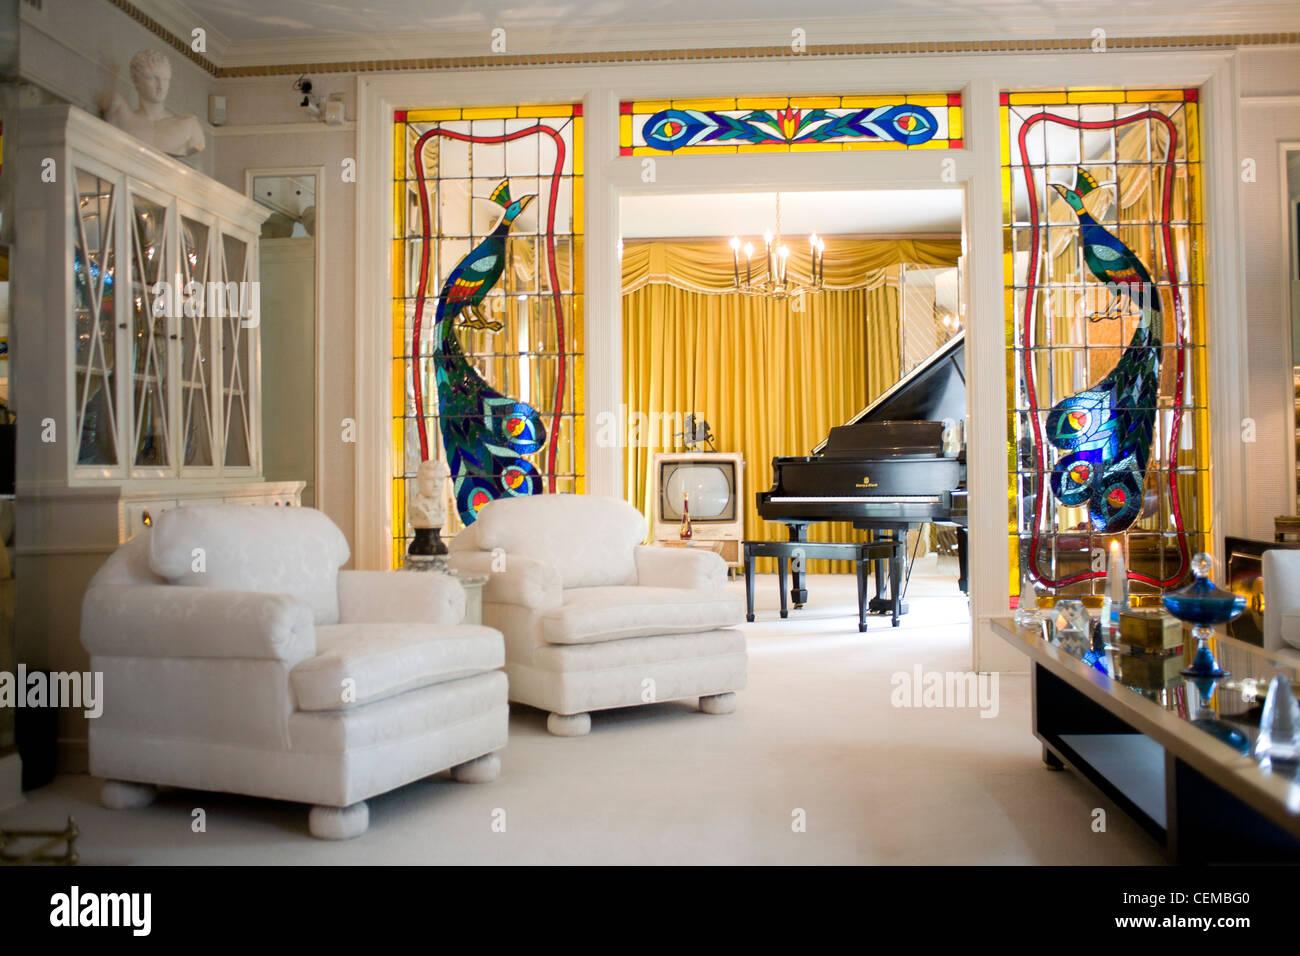 Elvis Presleys Graceland Home Interiors Stock Photos & Elvis ...